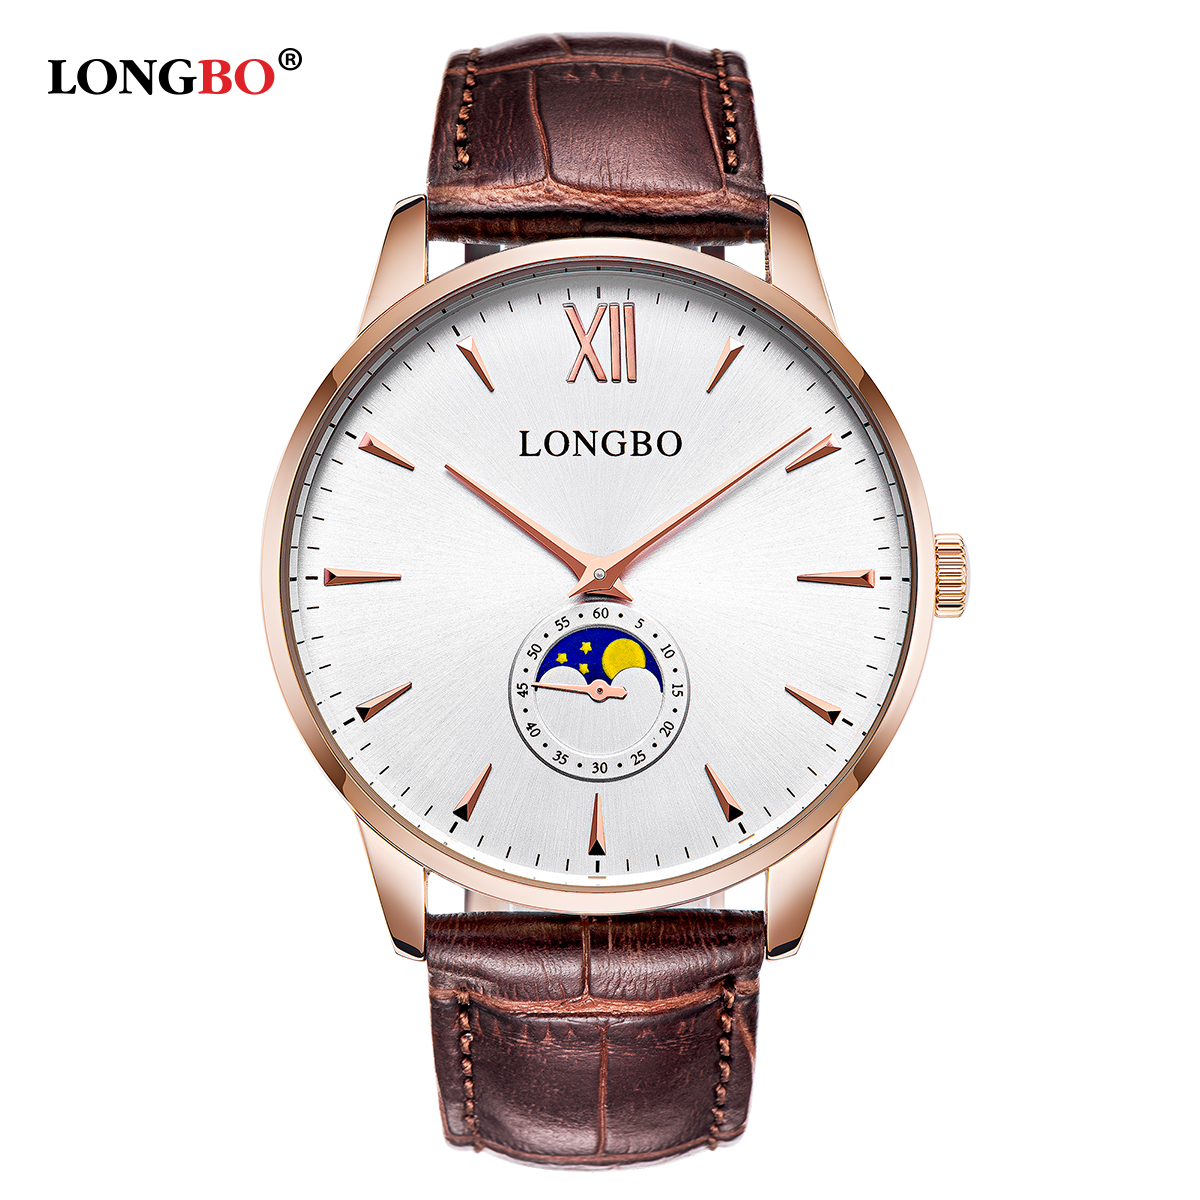 Fashion Luxury Lovers Dress Watches Simply Style Leather 30m Waterproof Women Men Lady Business Casual Quartz Watch Wristwatch<br><br>Aliexpress